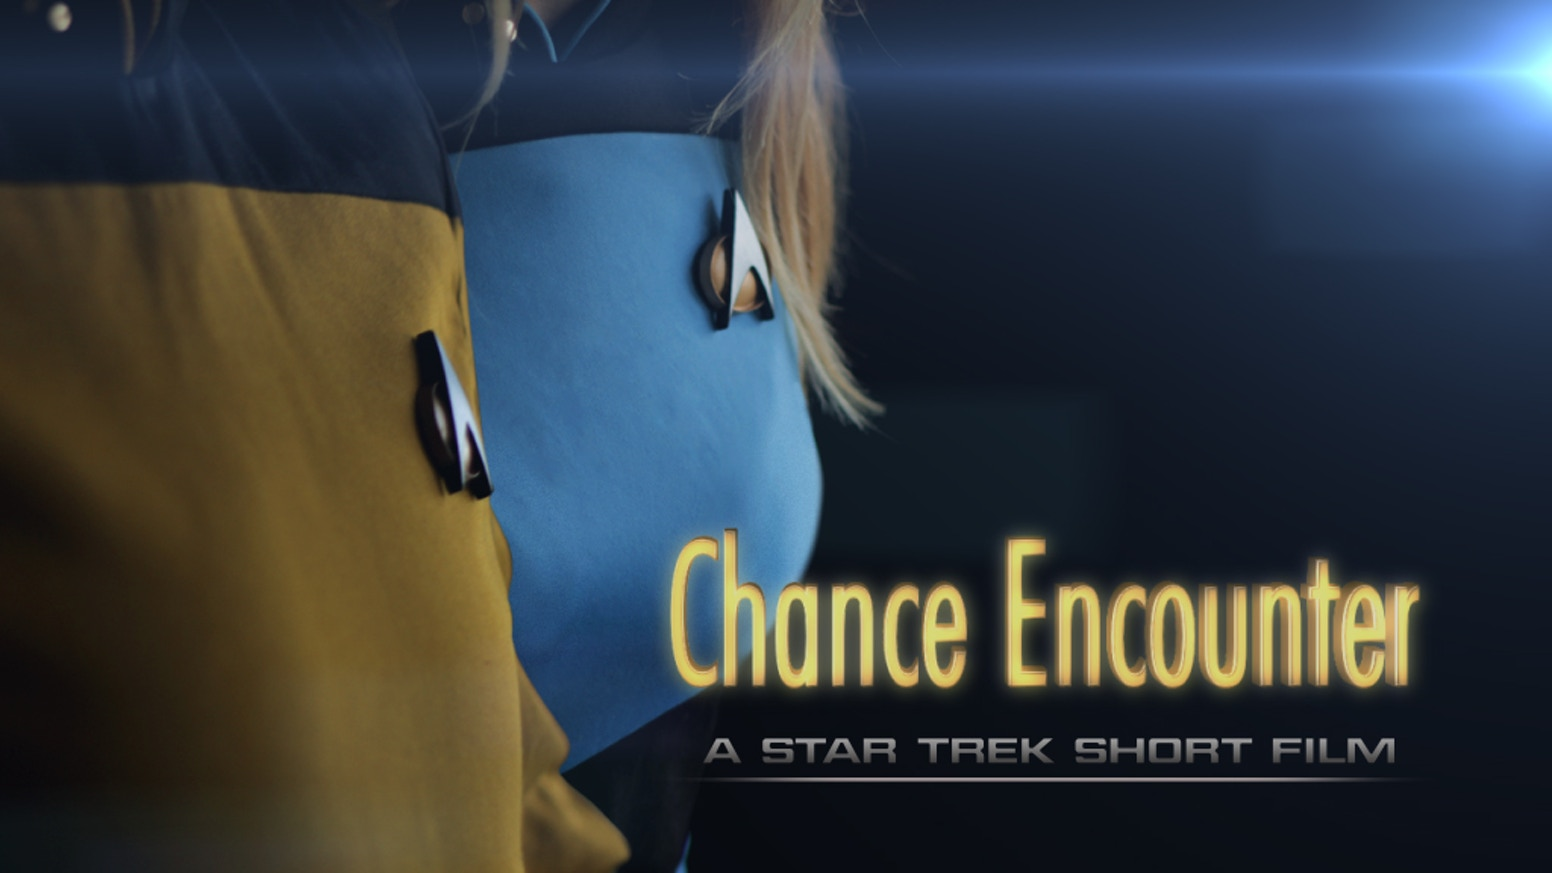 Chance Encounter - A Star Trek short film by Gary O'Brien